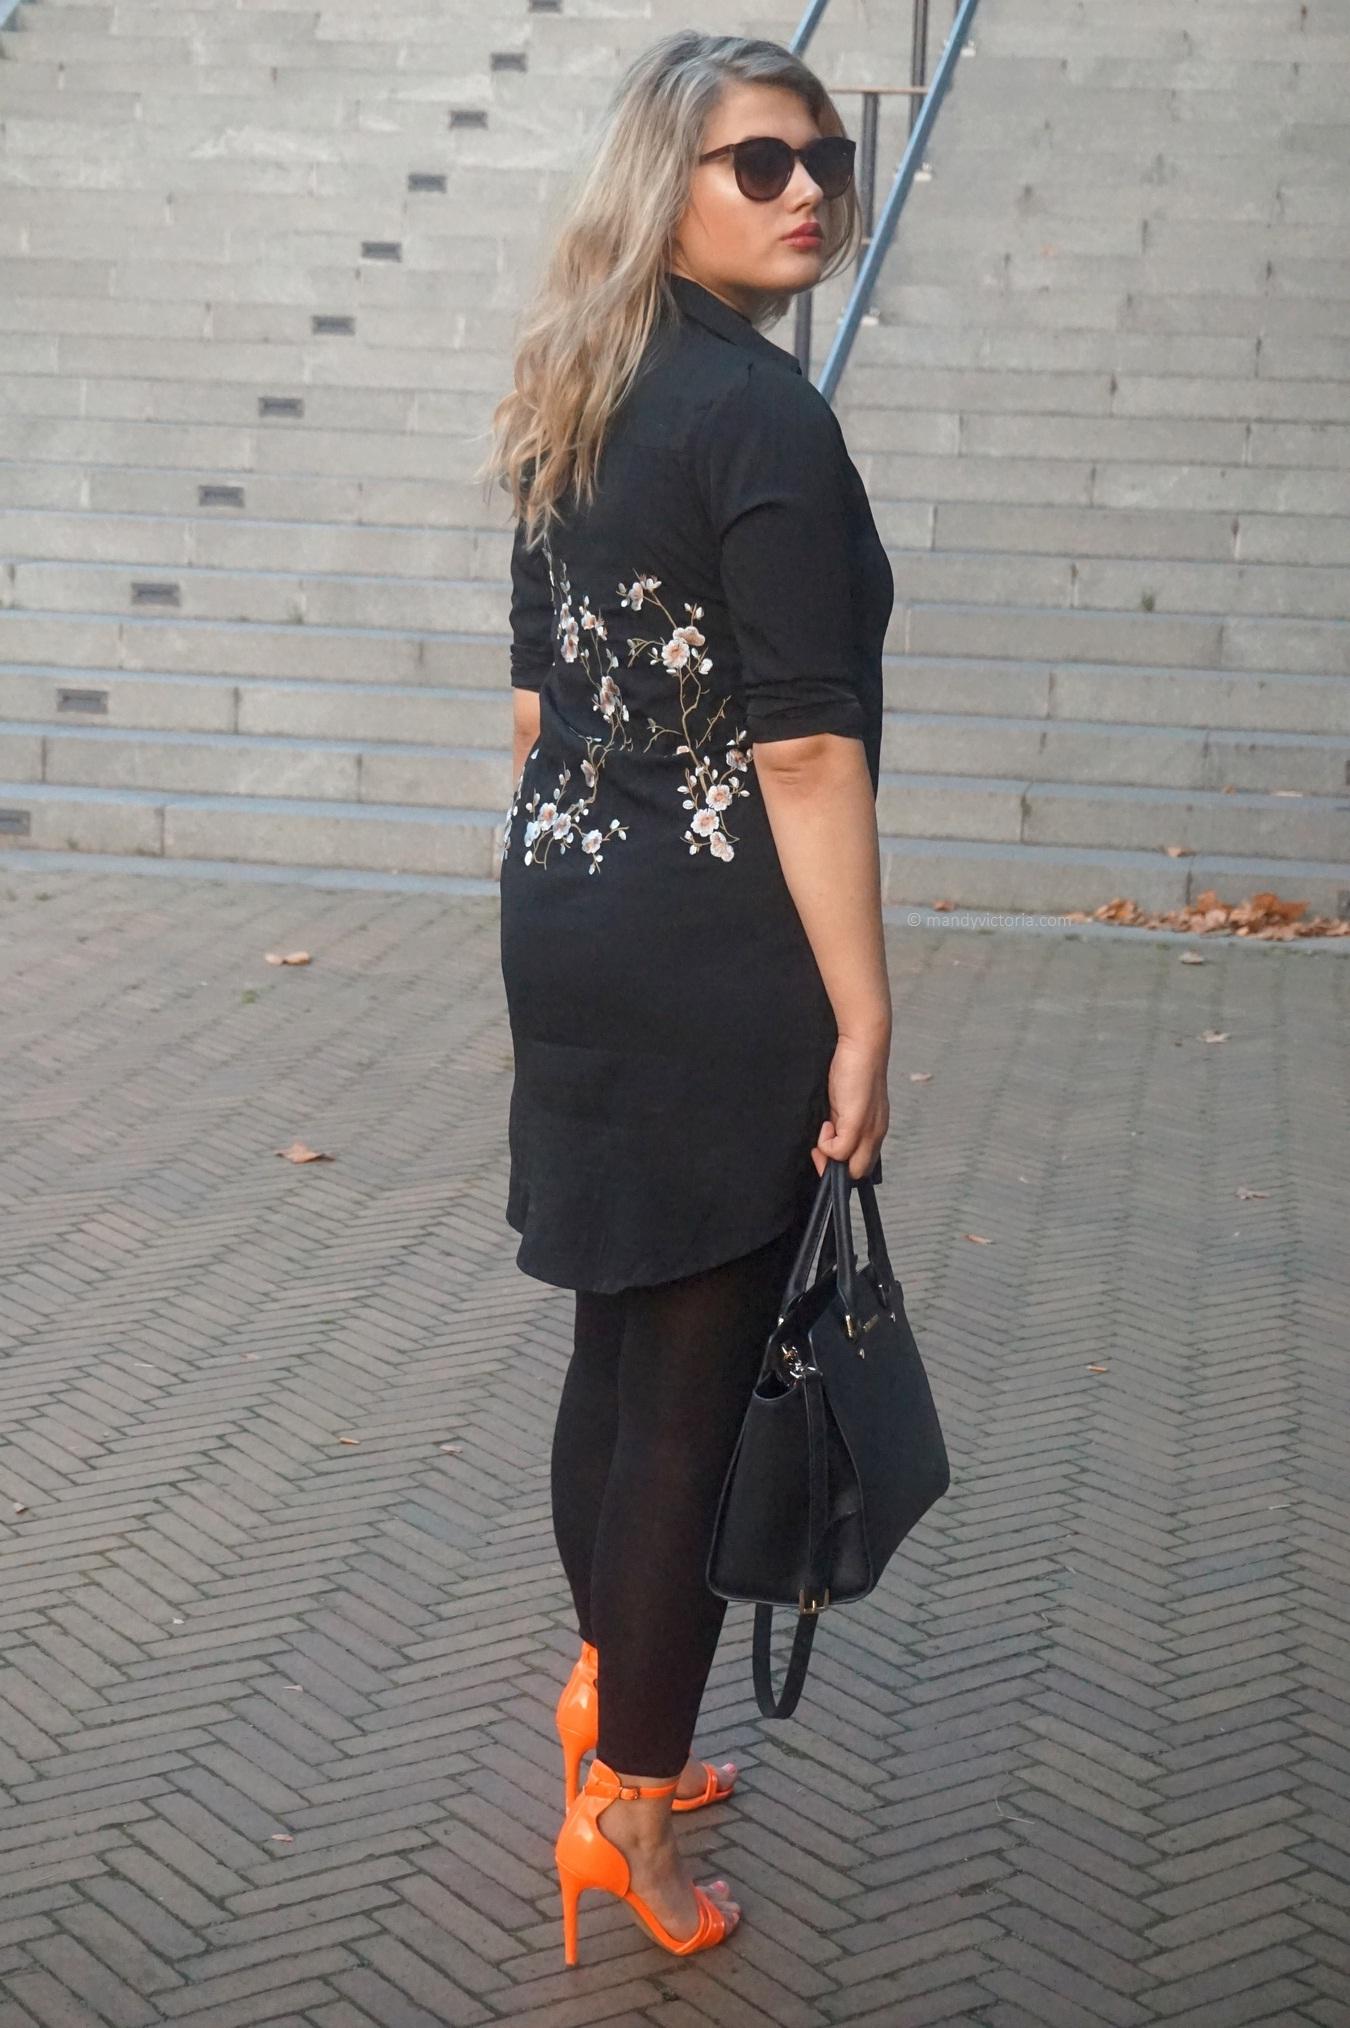 outfit_mandyvictoria_sakura5